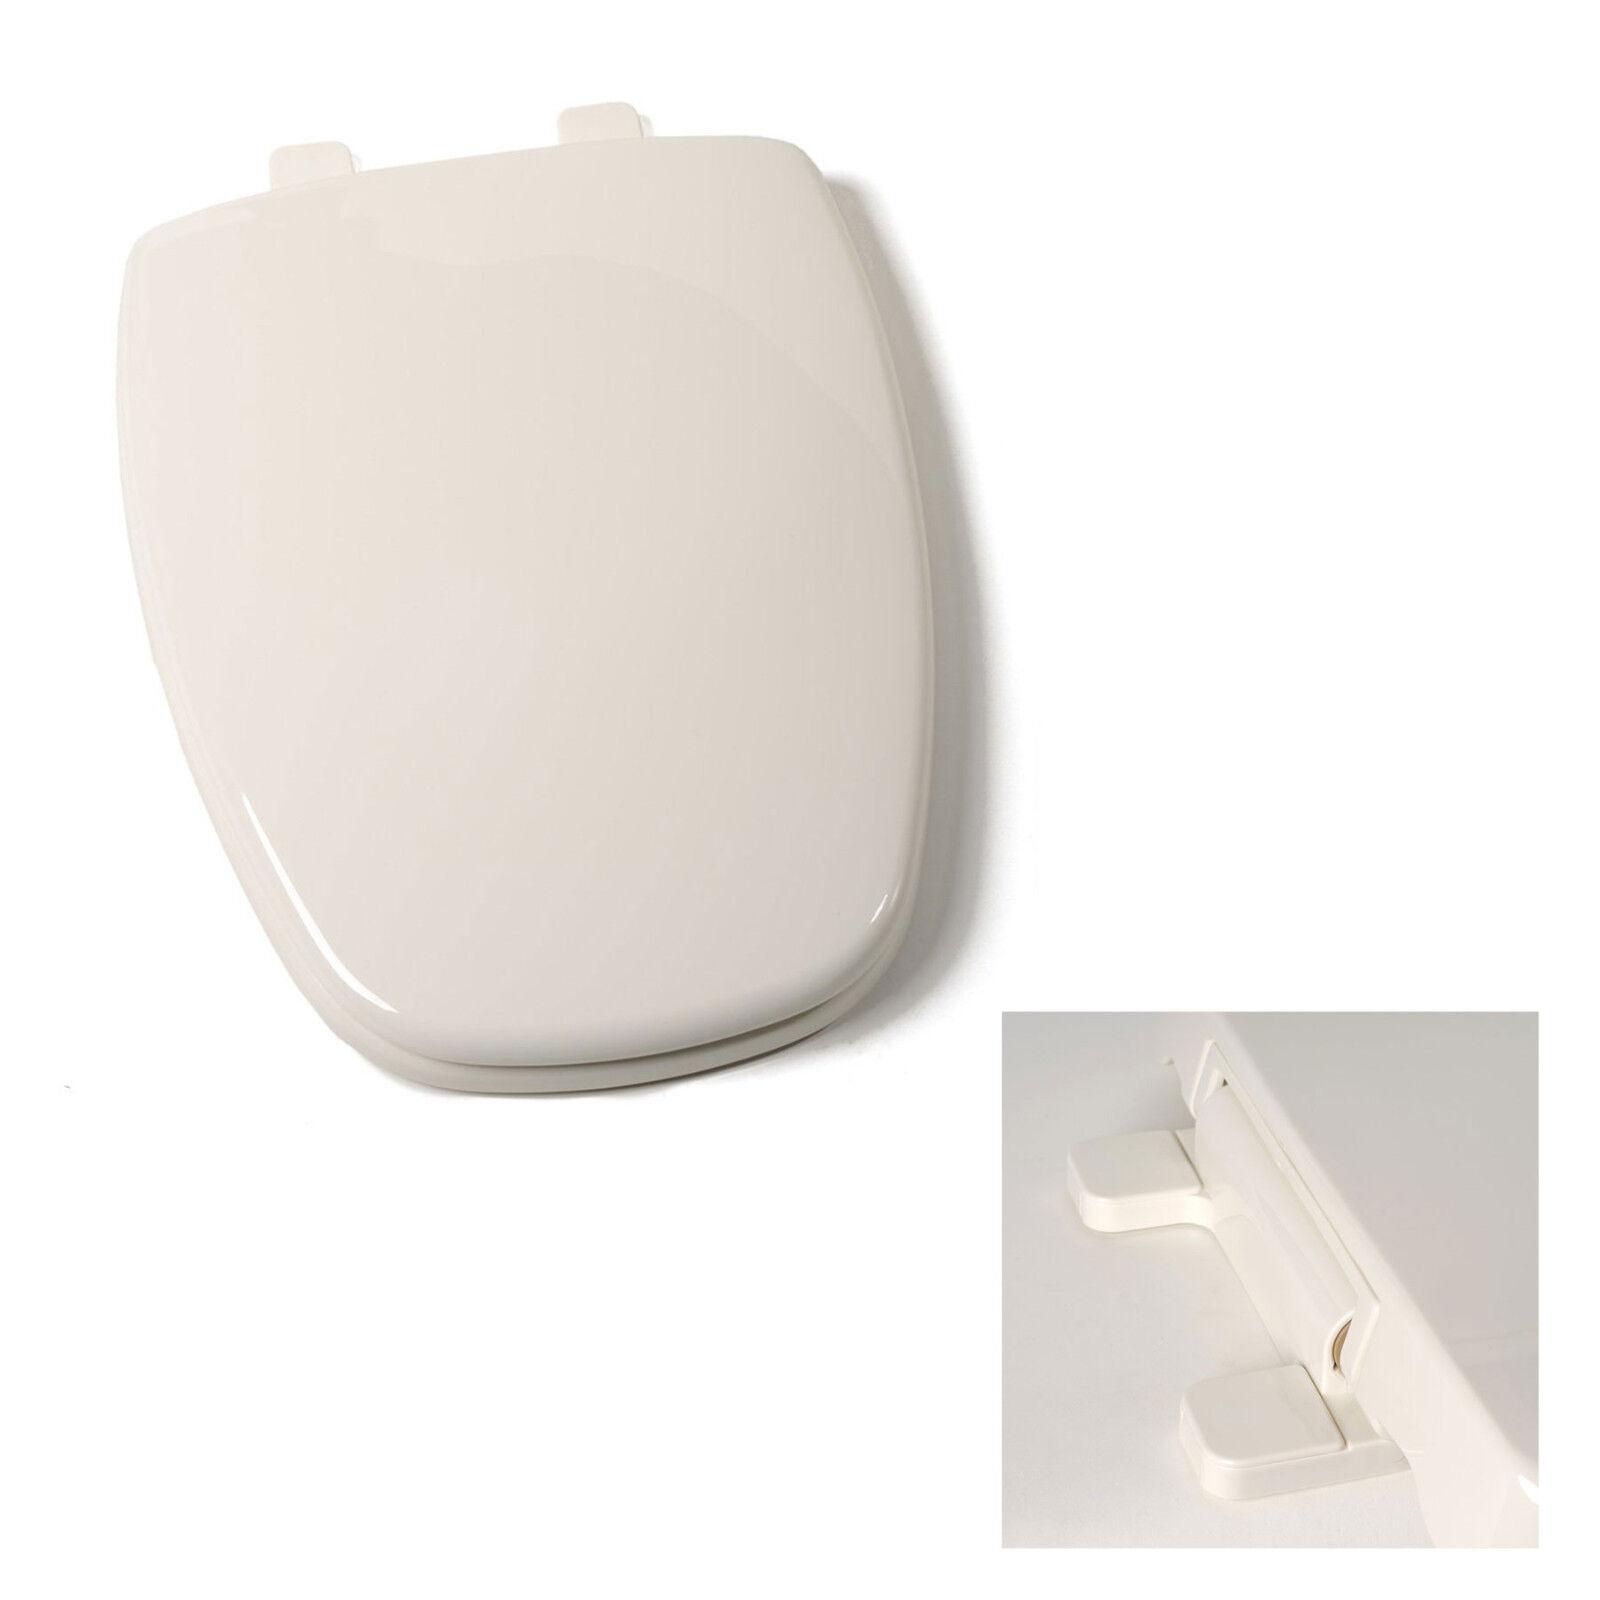 Round Molded Wood Toilet Seat Slow Close ∙ Easy Remove ∙ Adjustable Hinge Bone